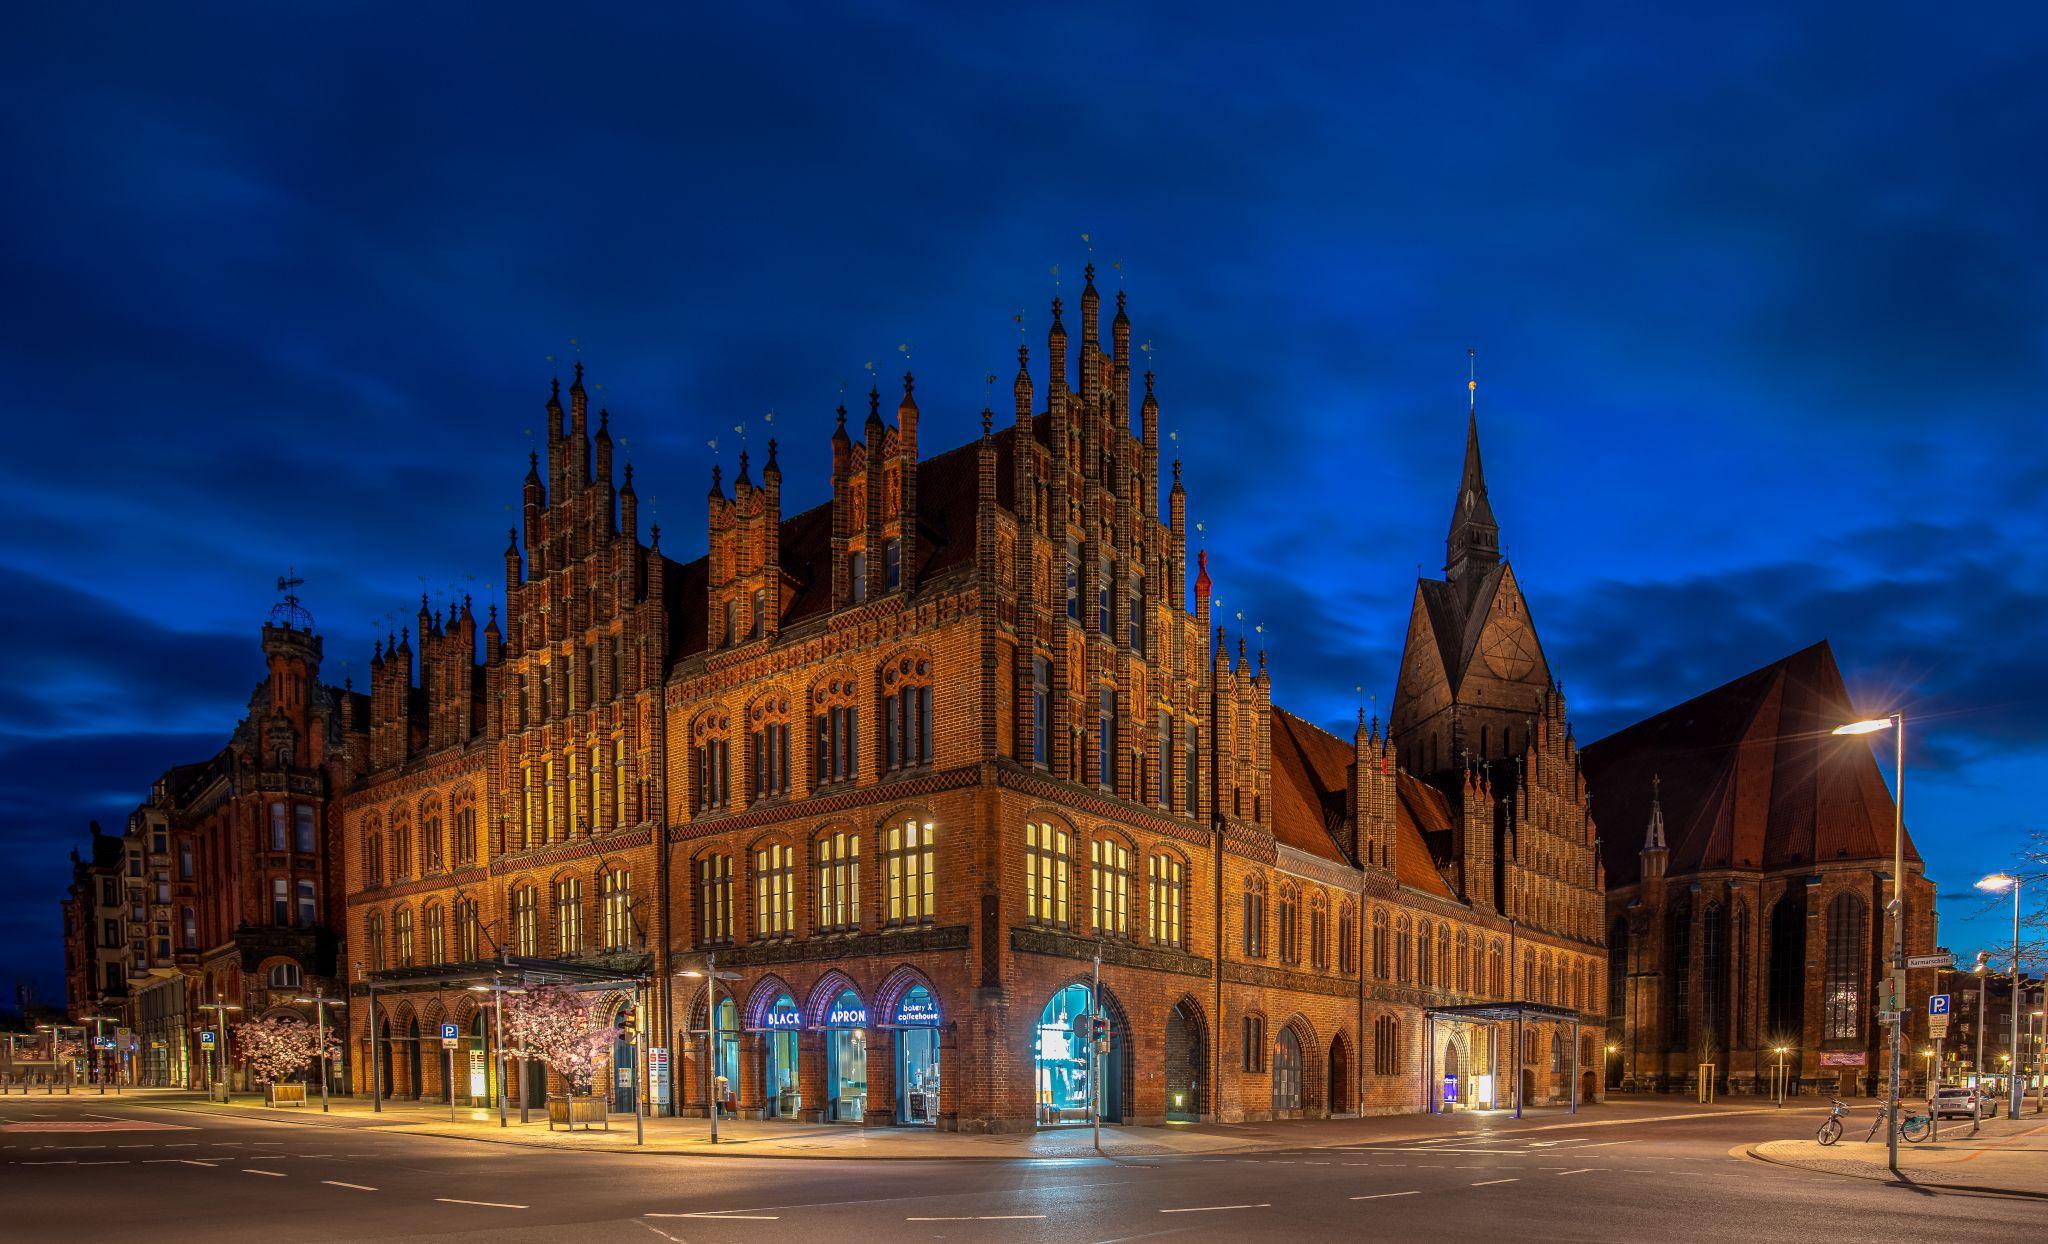 Altes Rathaus Hannover mit Marktkirche, Germany